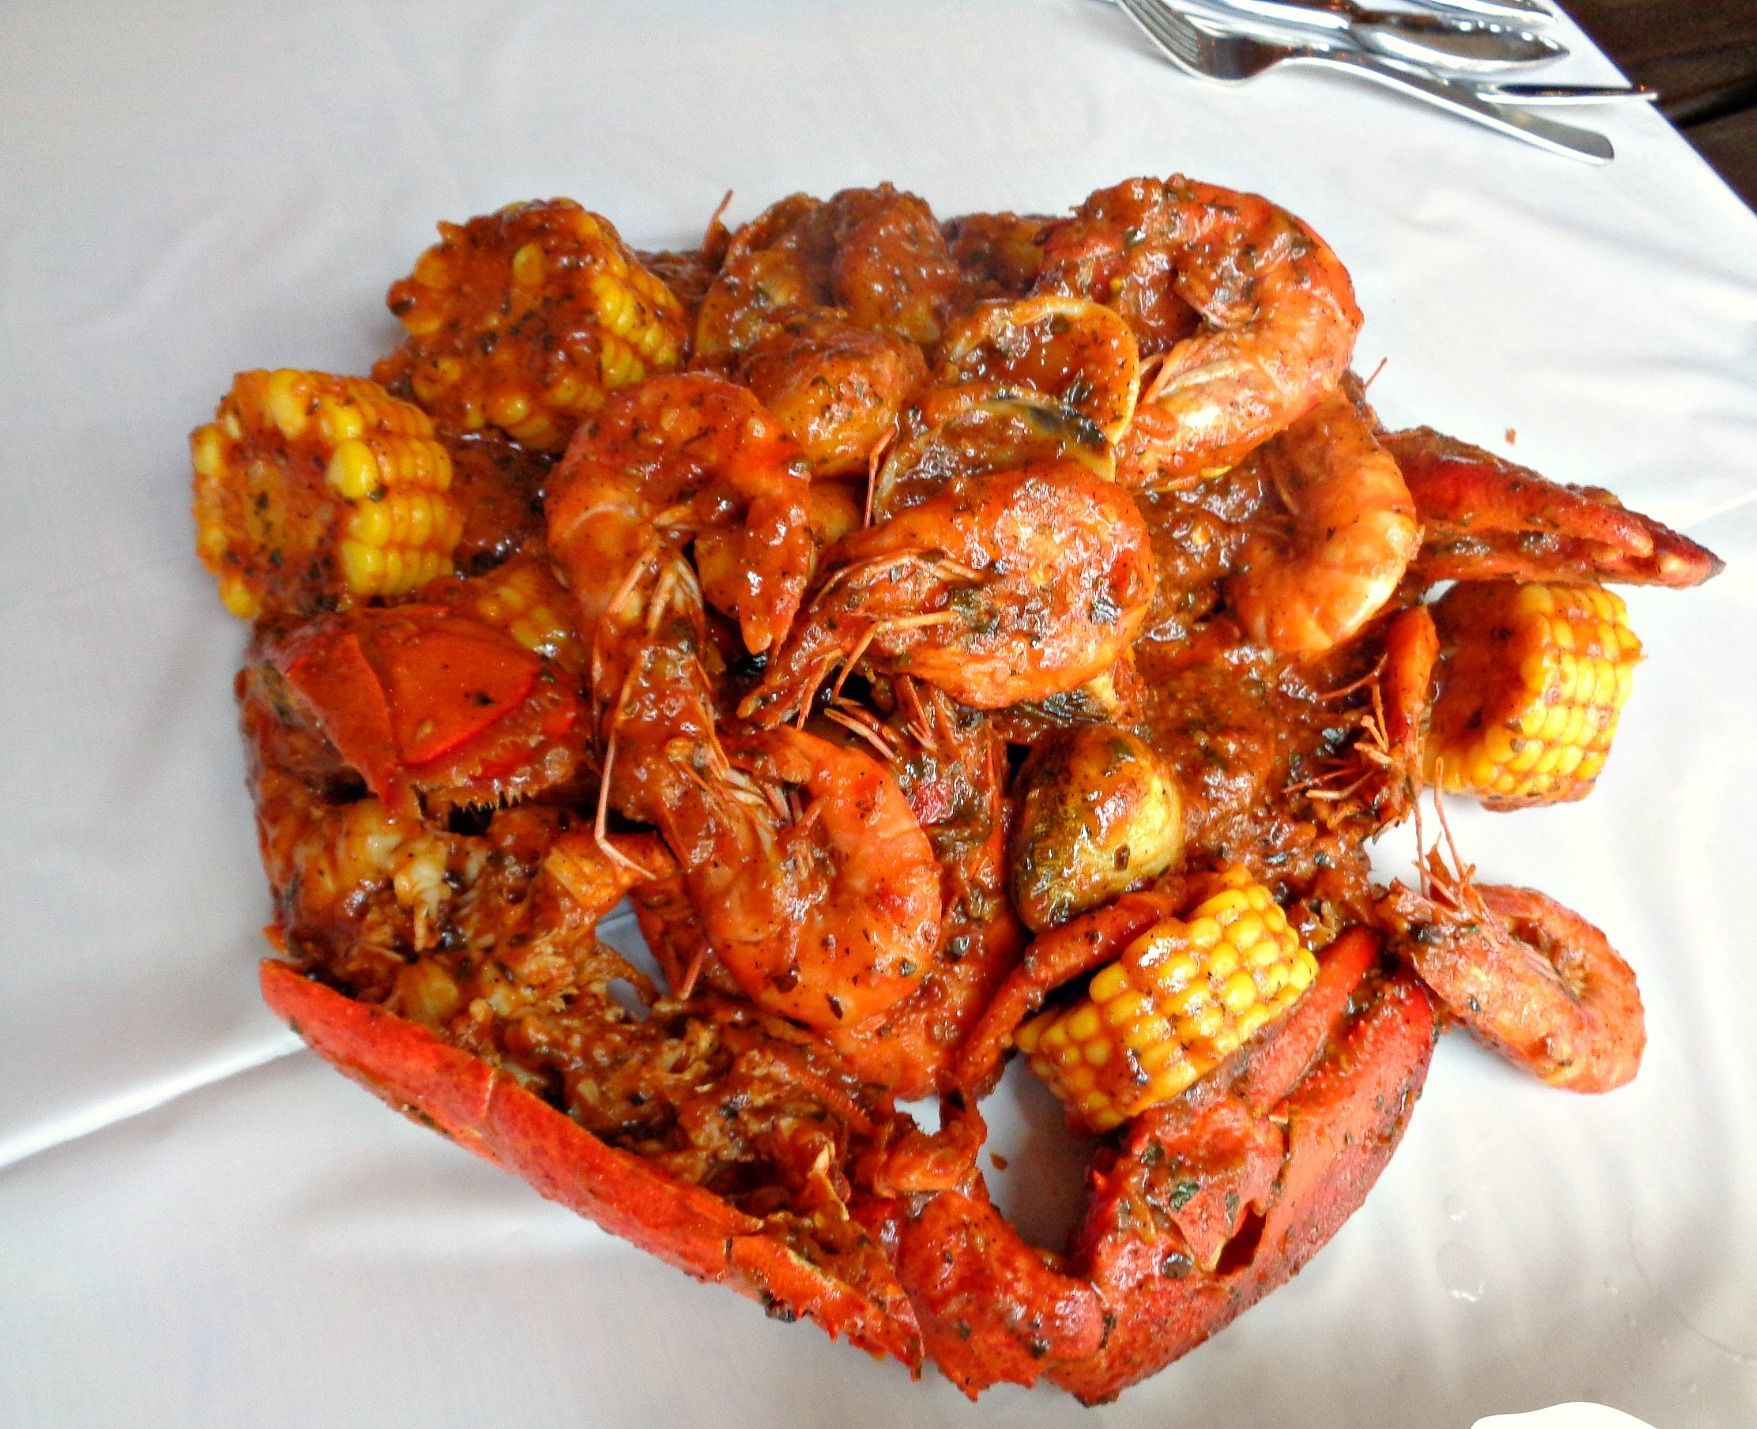 Whole Food Augusta